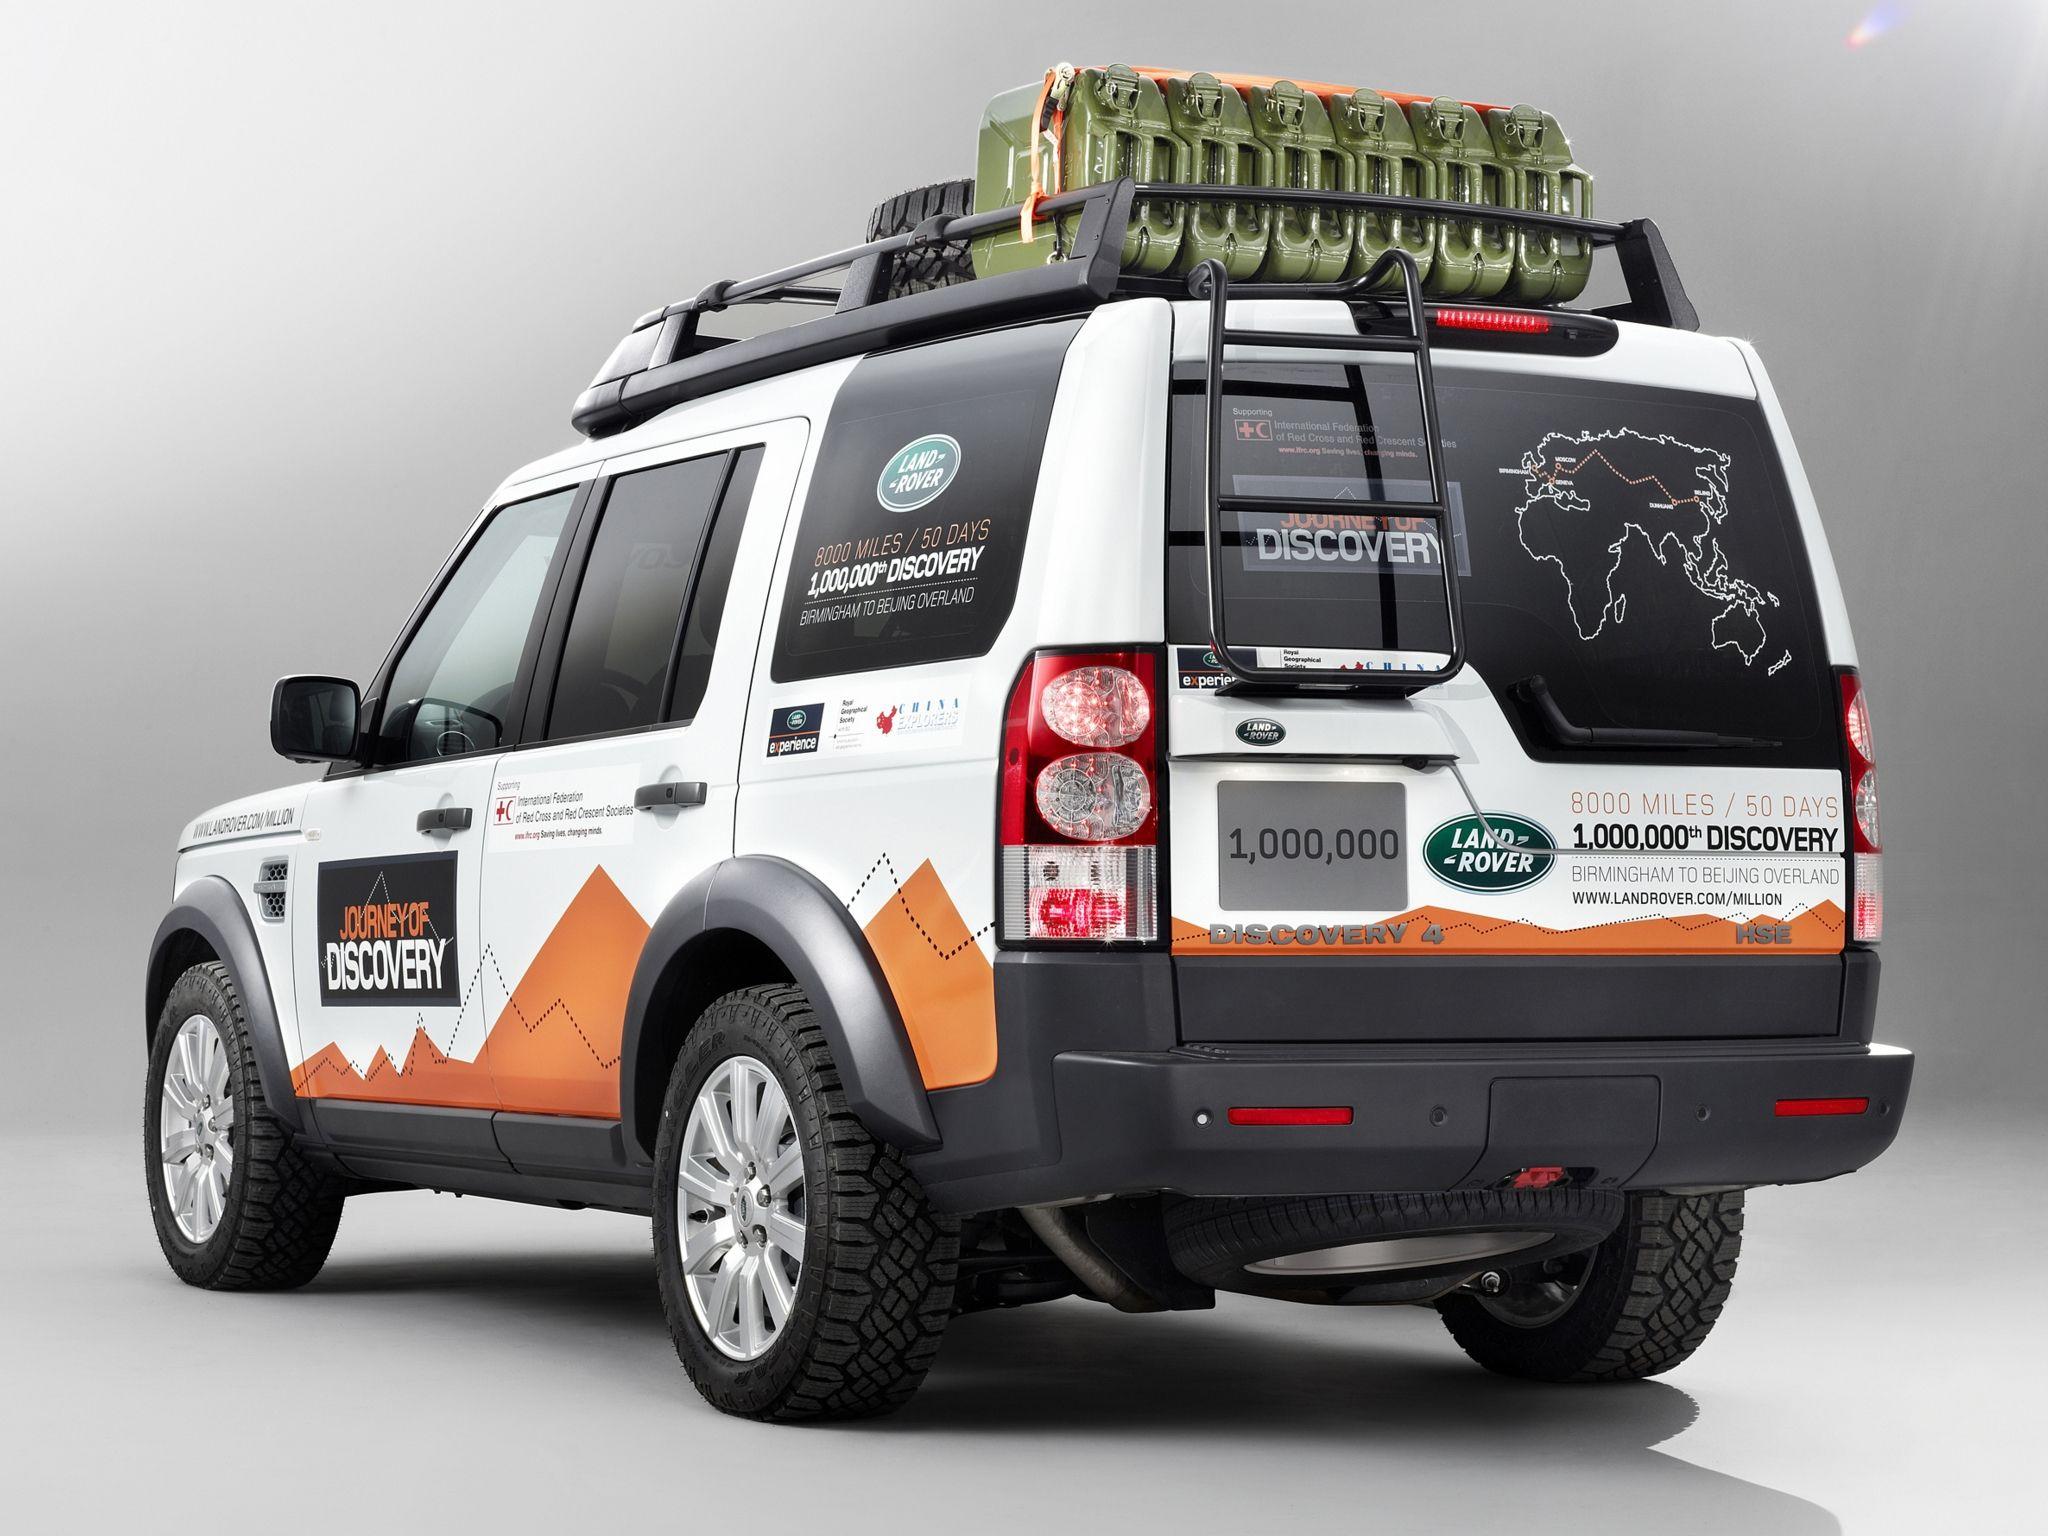 land rover discovery 3 Google zoeken Land Rover